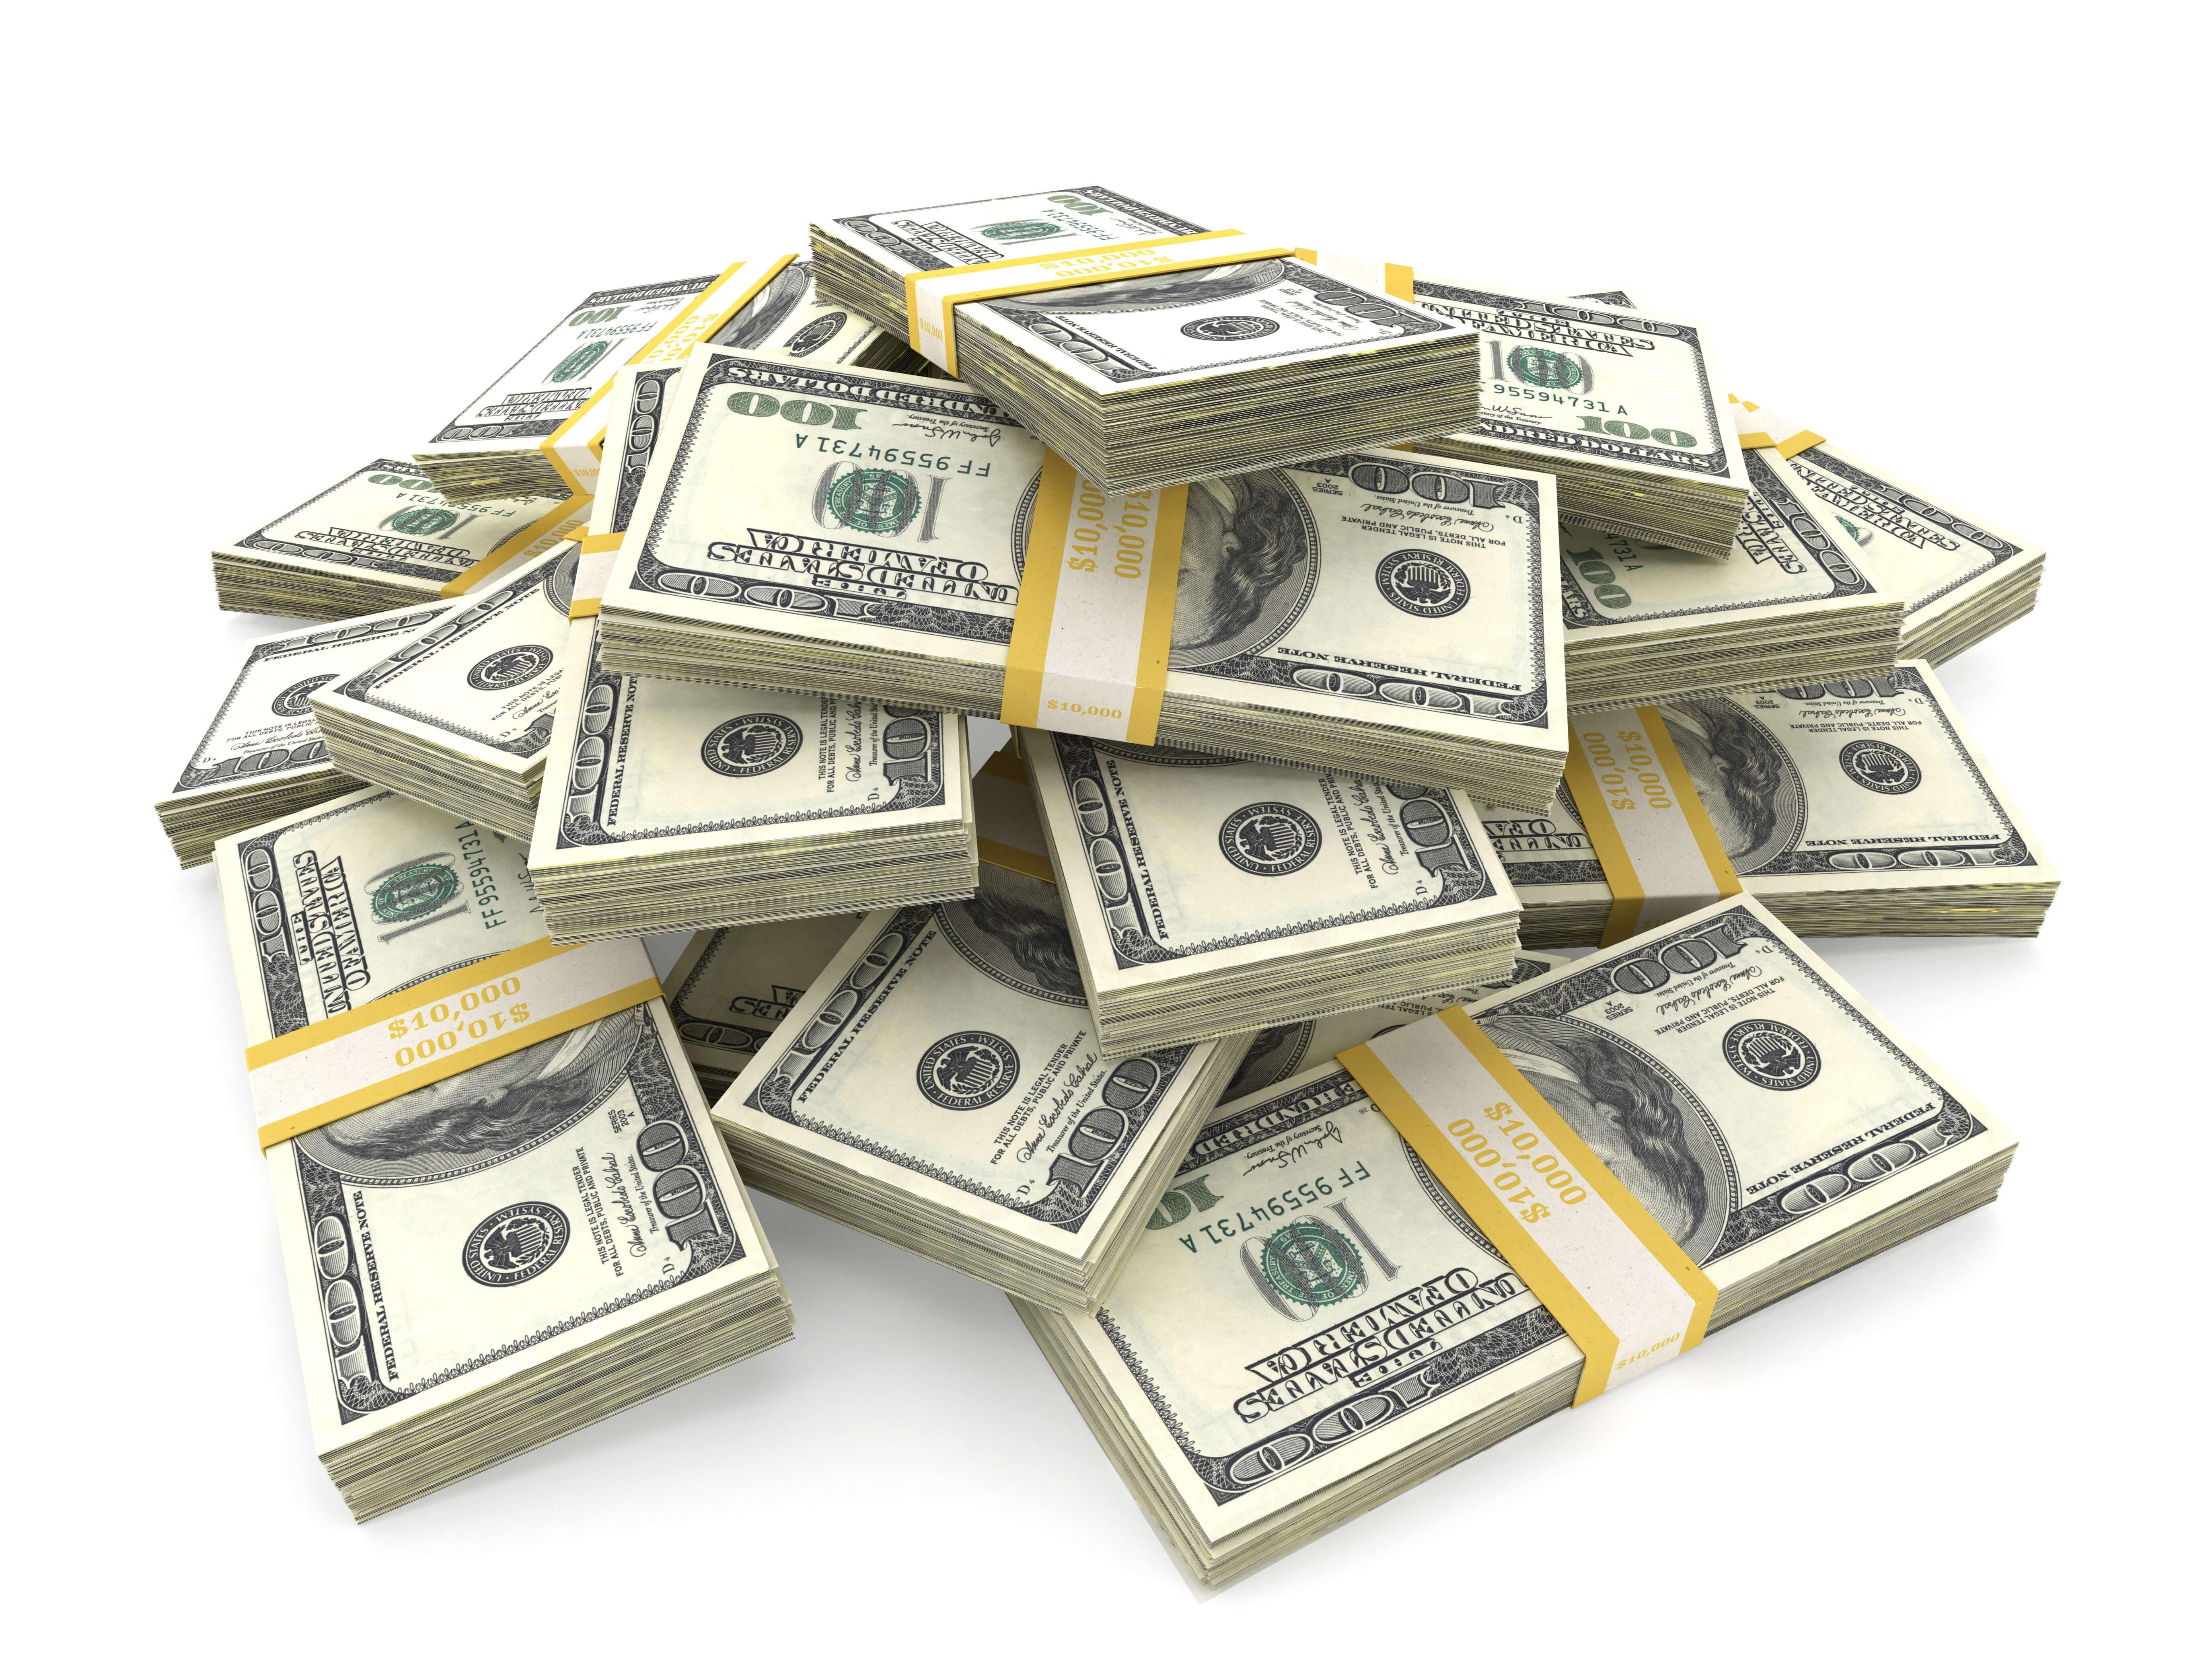 Stacks_of_cash_money.jpeg